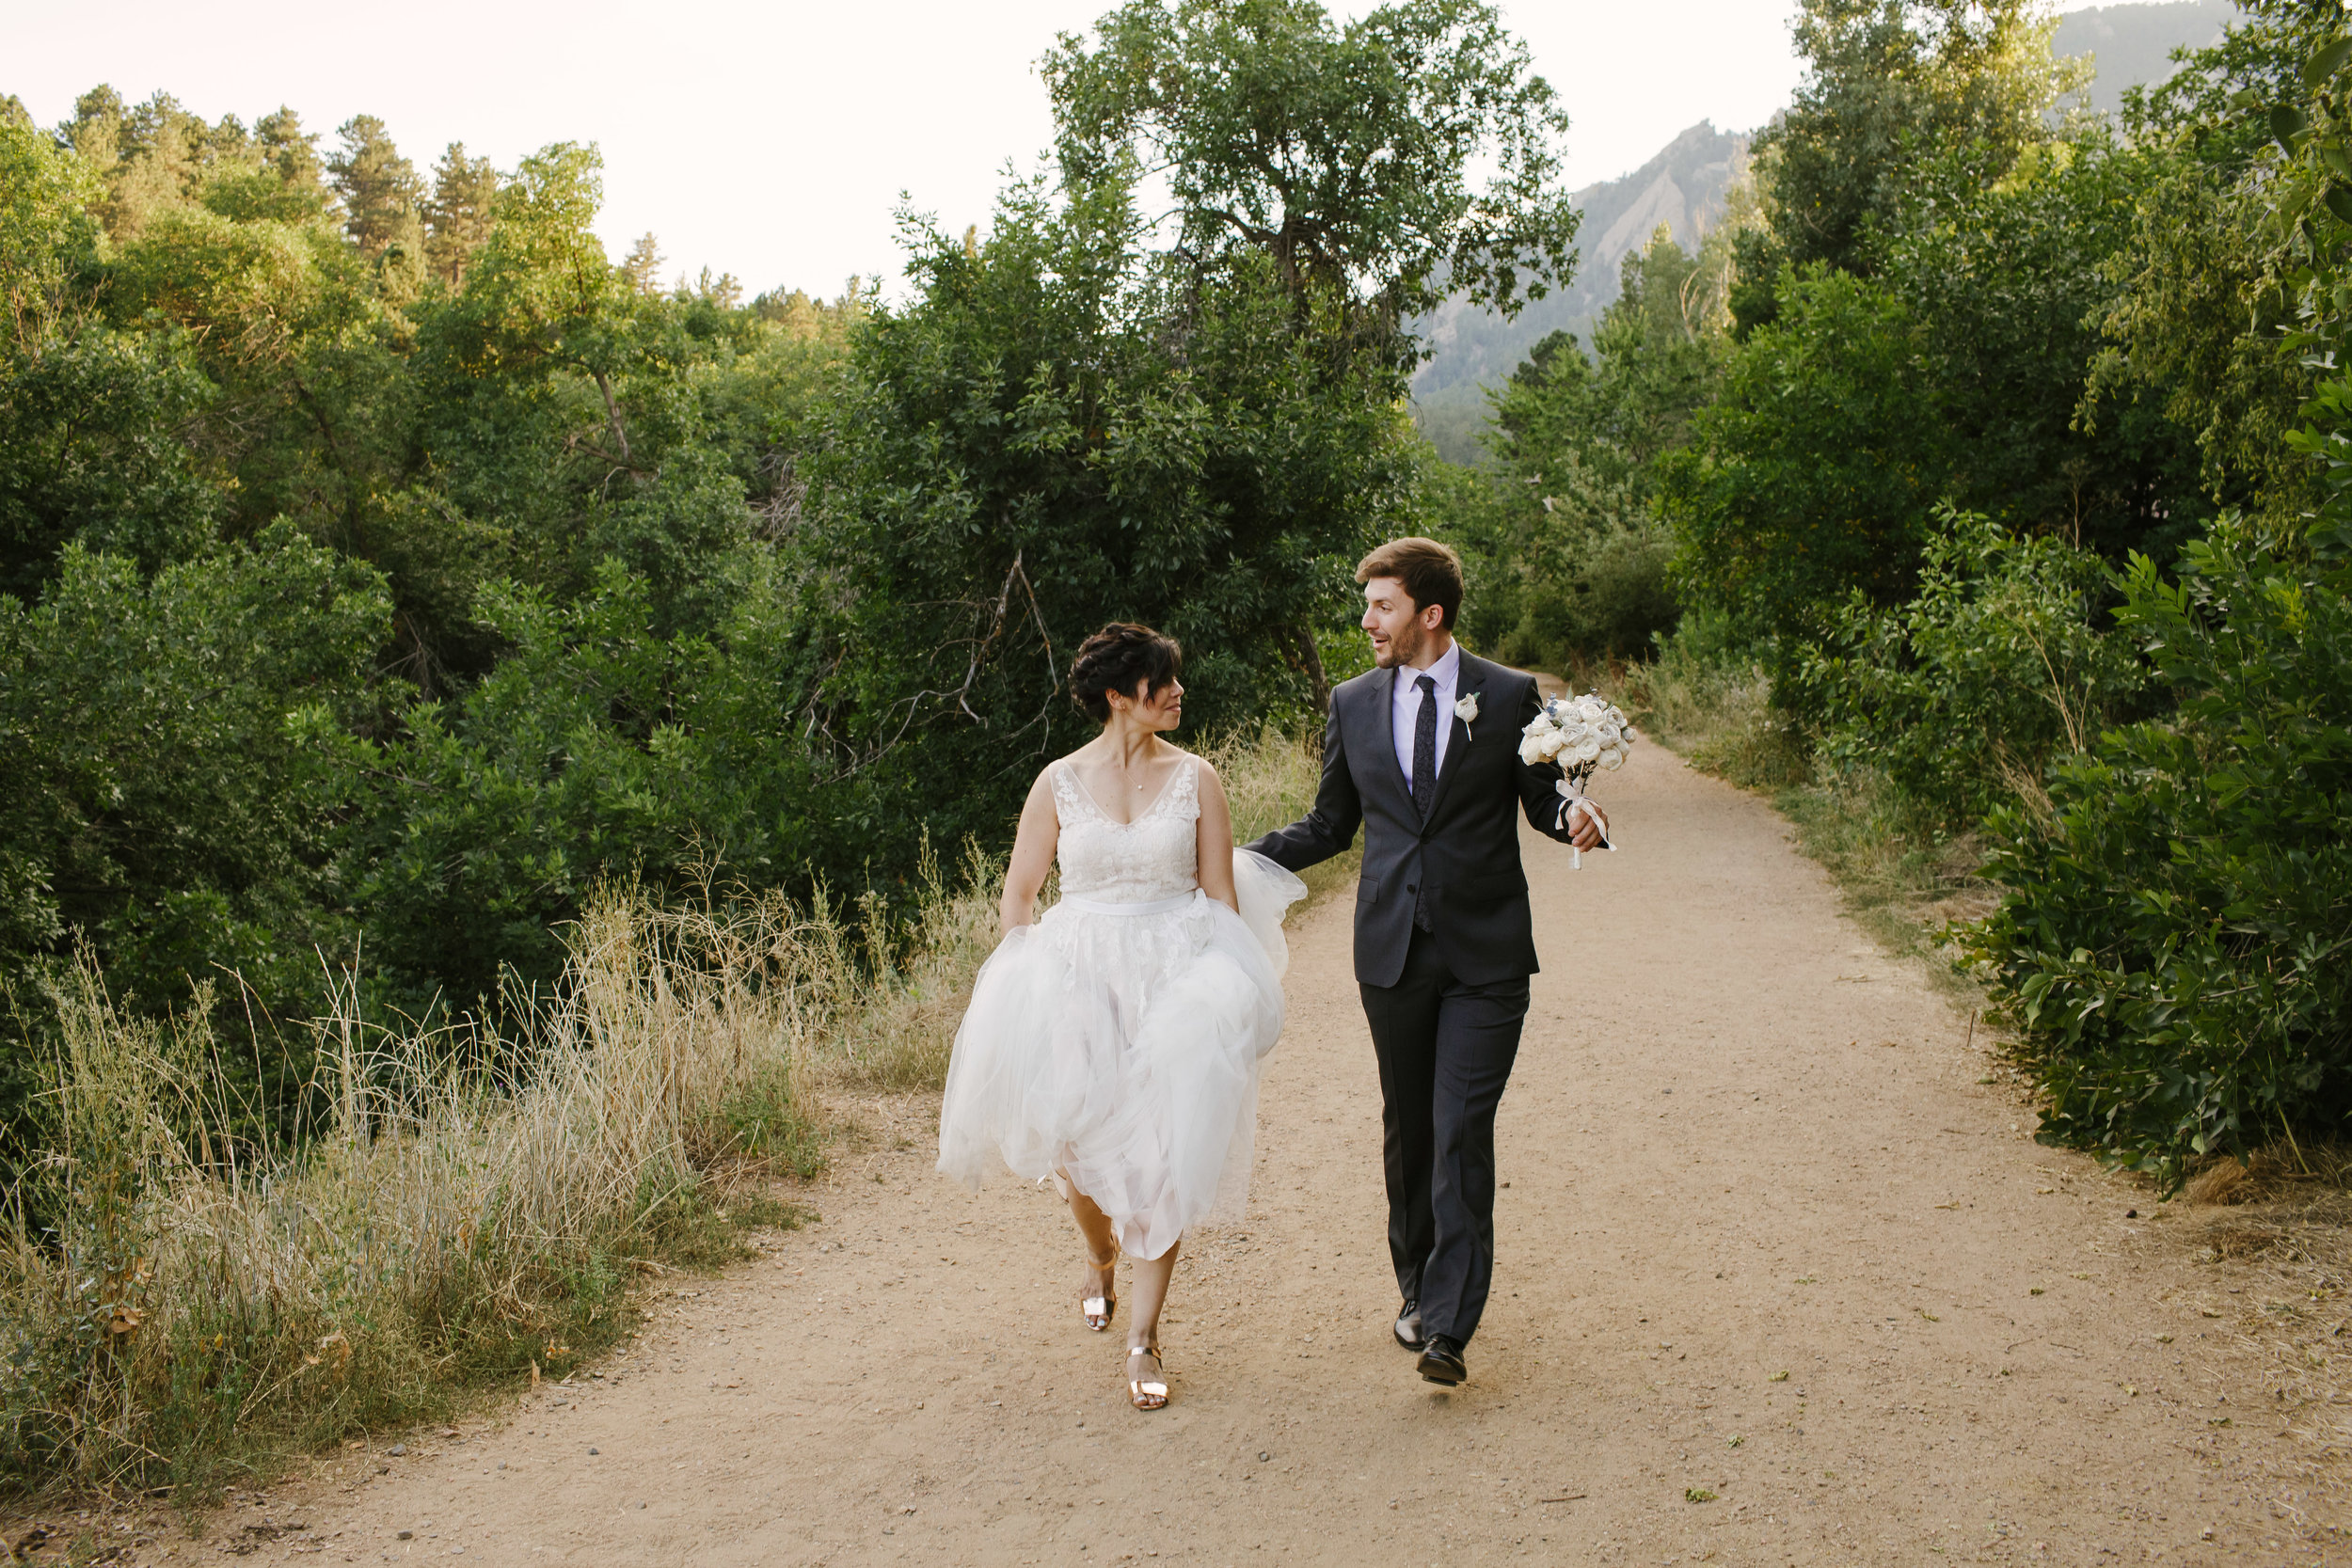 Chautauqua Park Wedding Day Photos